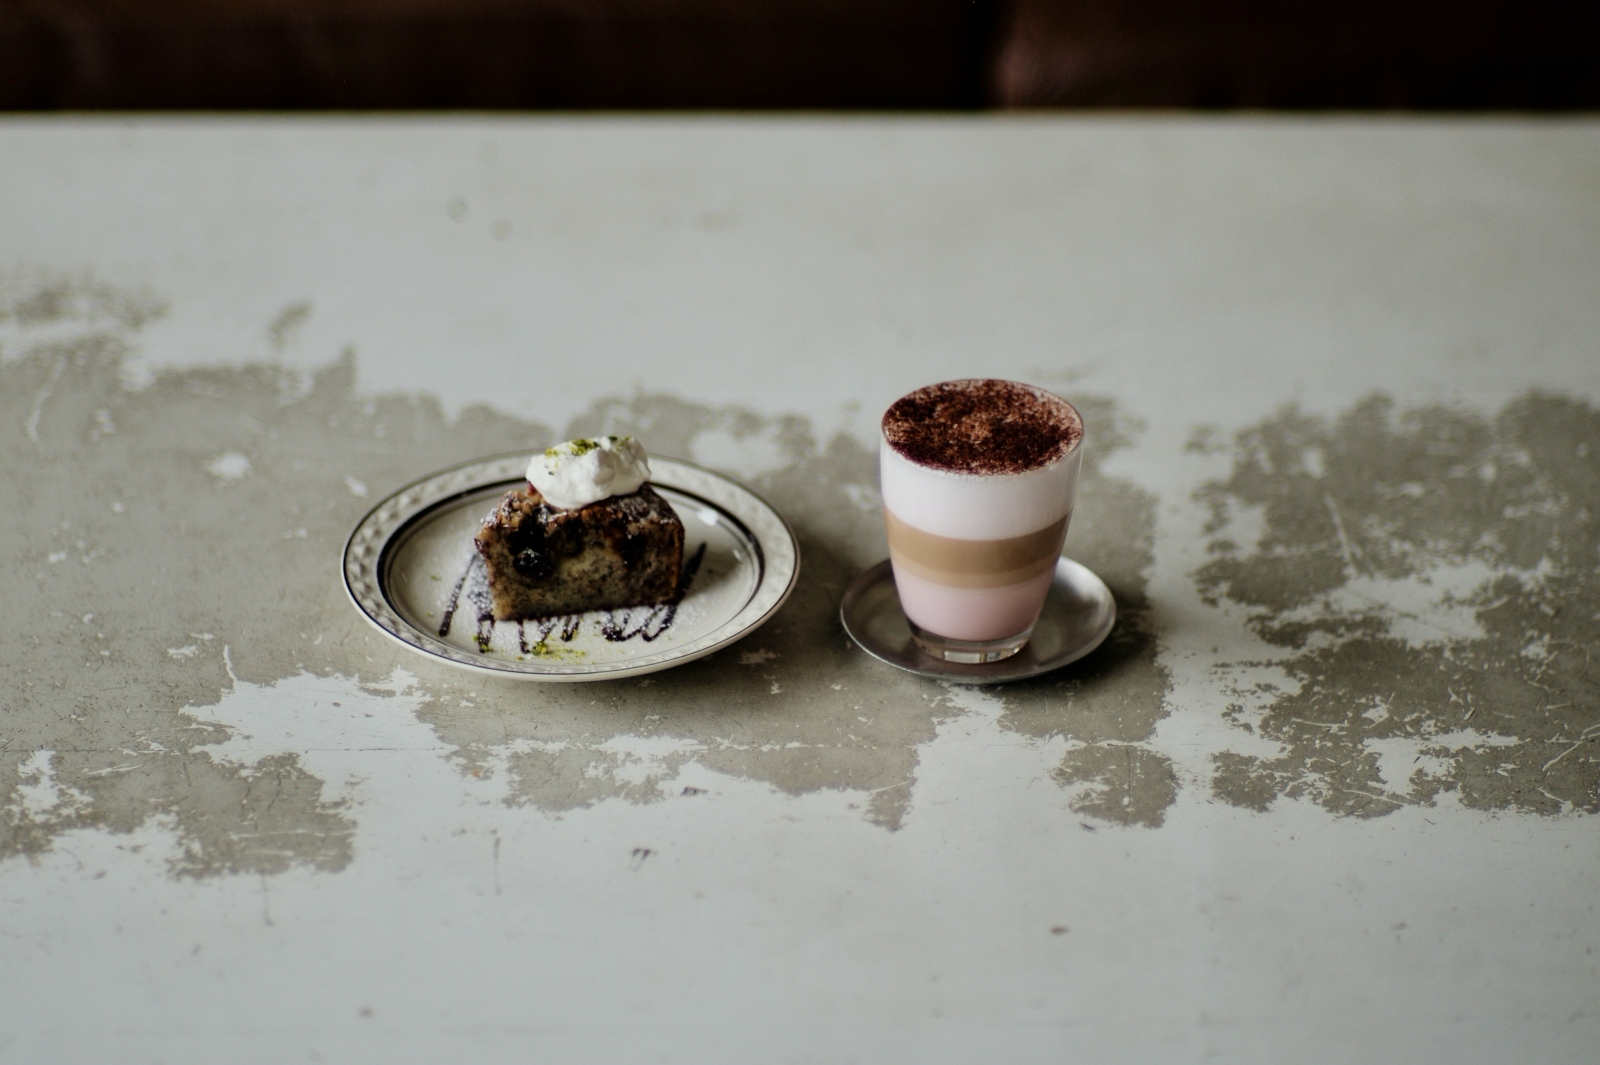 Travelogue<br> チョコレートを巡る旅〈瀬戸内編その①〉島と海と猫、時々チョコレート。